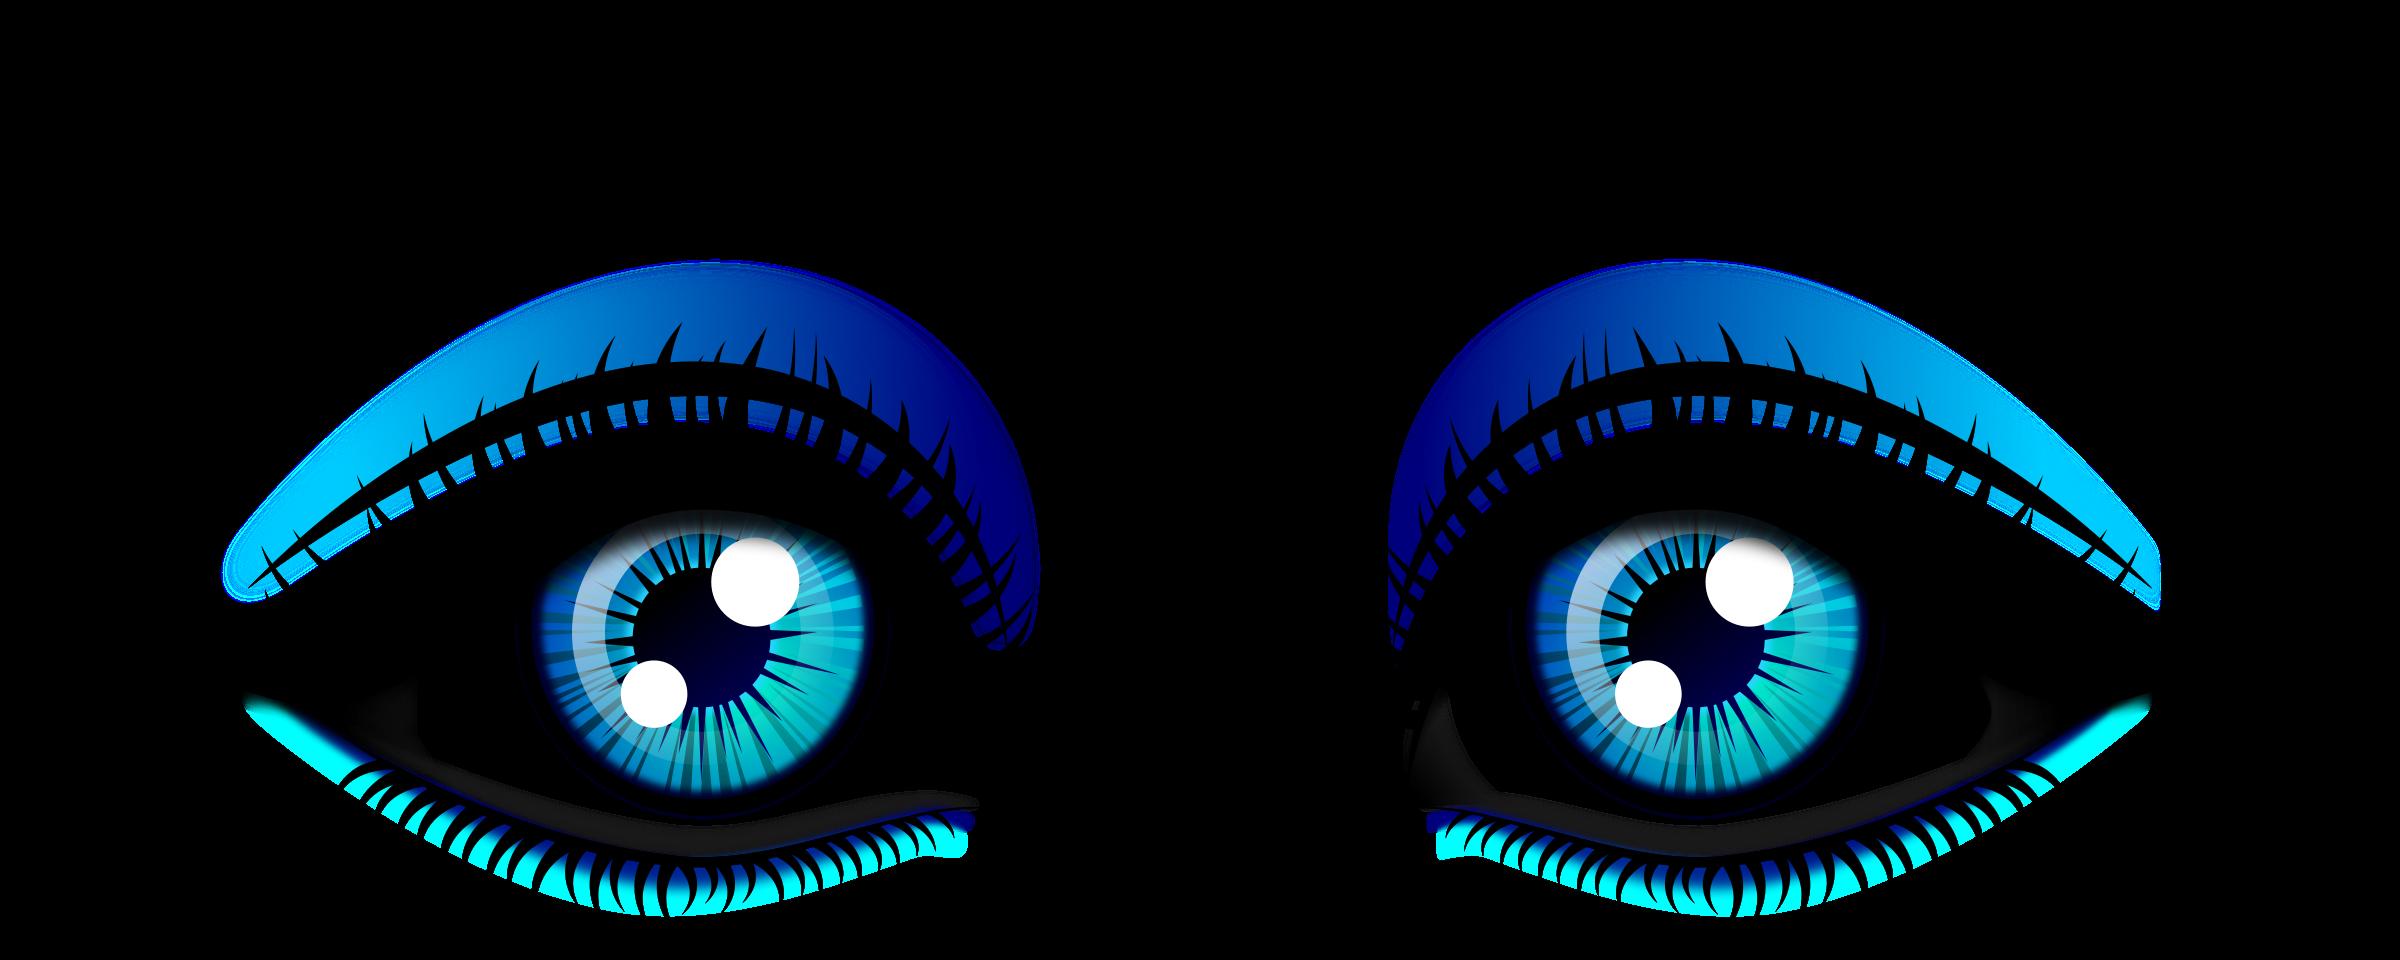 2400x960 Image Of Cartoon Eyes Clipart 6 Clip Art 2